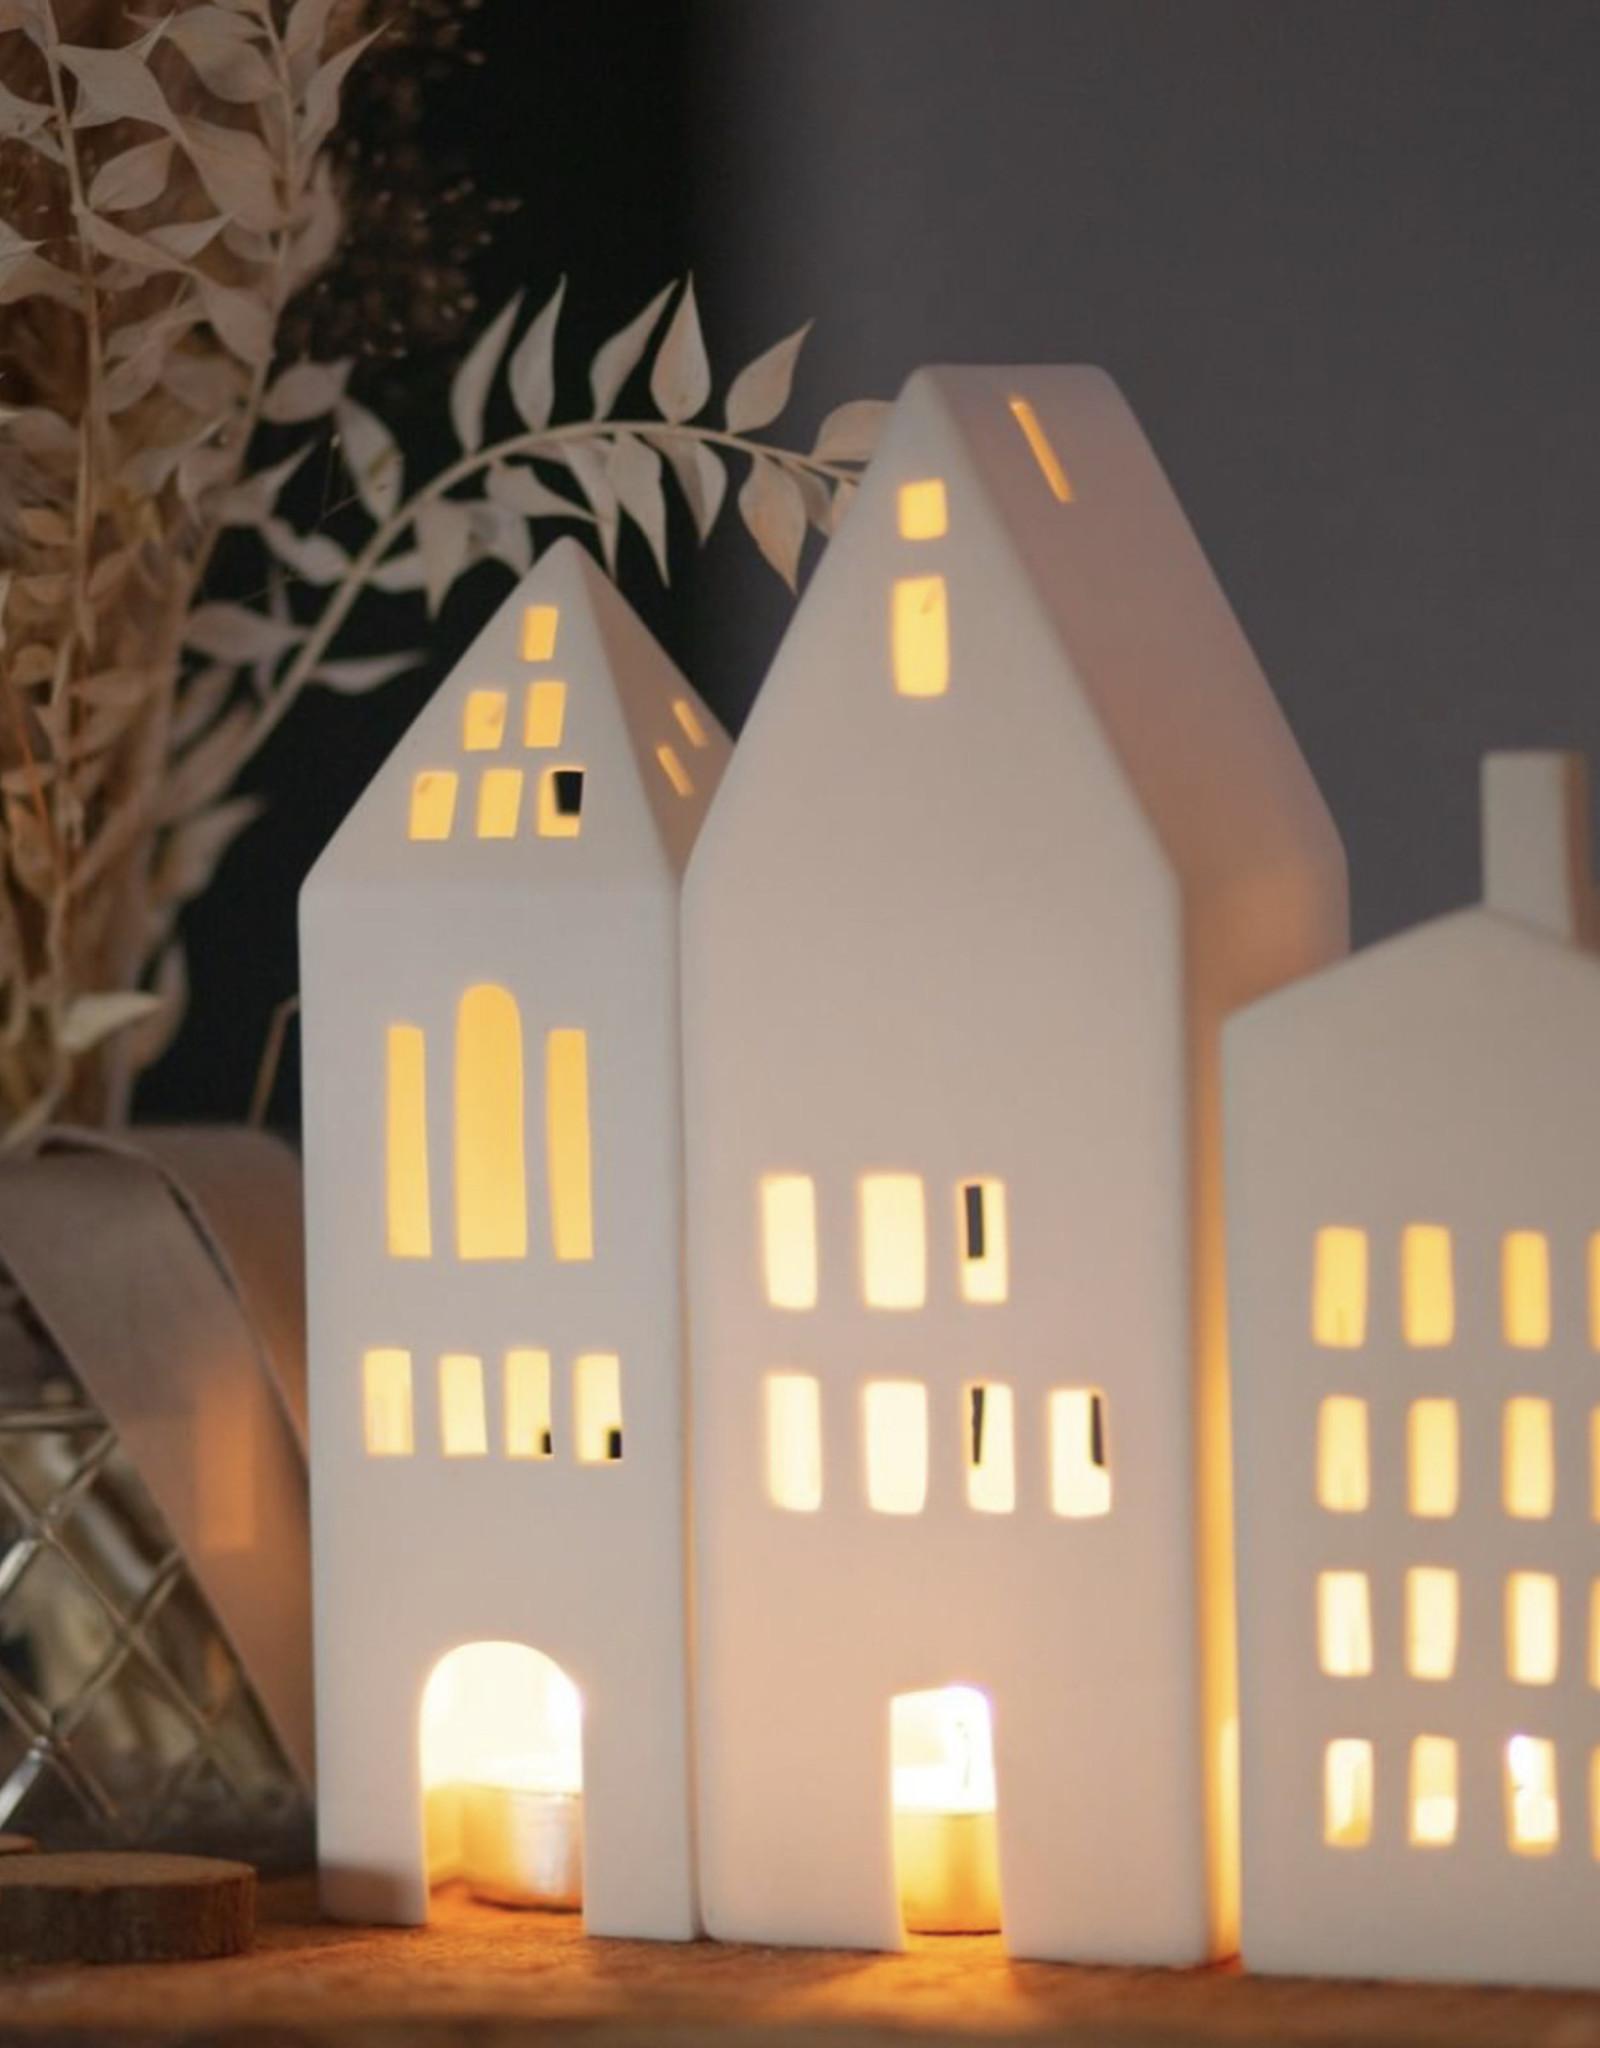 Räder Rader - Light house Big window